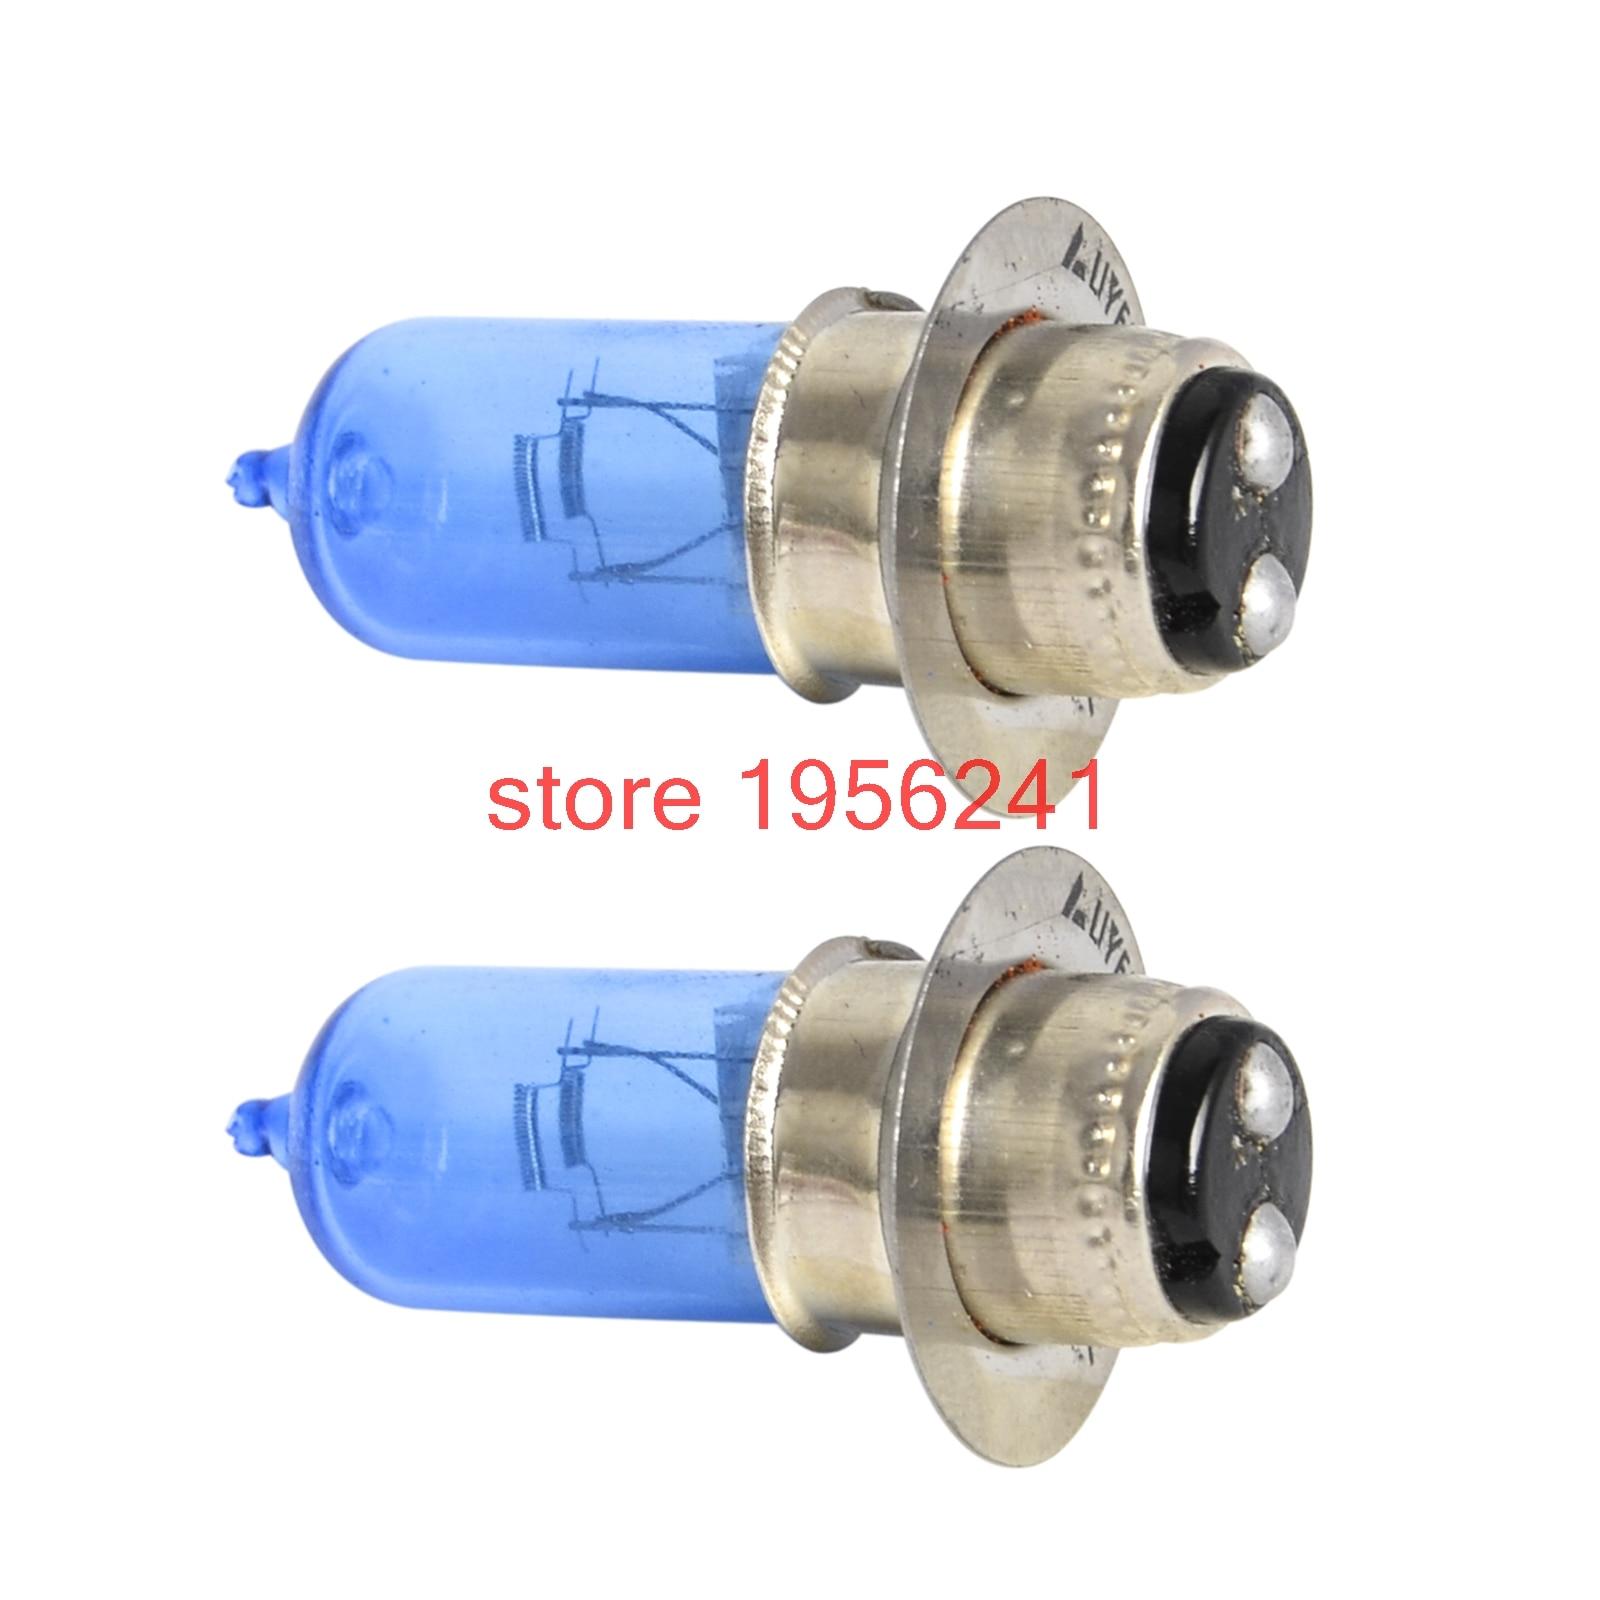 Super White Headlight Bulb For Yamaha YFM250 YFM350 Big Bear 250 350 Raptor 125 250 Rhino 450 660 700 TTR250 Warrior 350